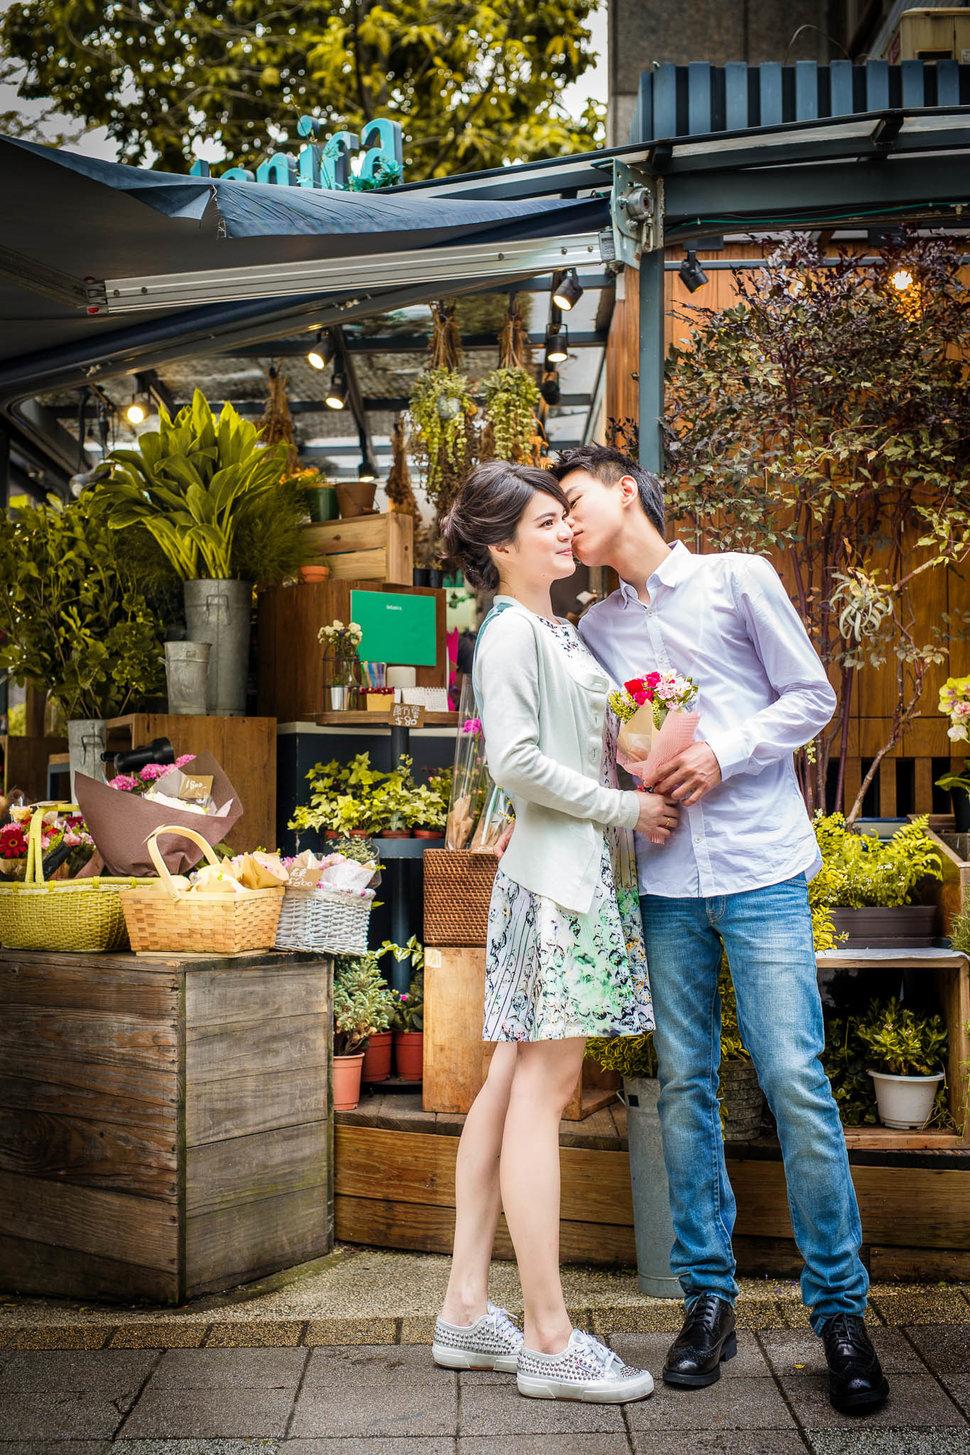 18PHOTO-元善❤️ 傳瑀(編號:308842) - 18PHOTO 婚紗影像攝影工作室 - 結婚吧一站式婚禮服務平台